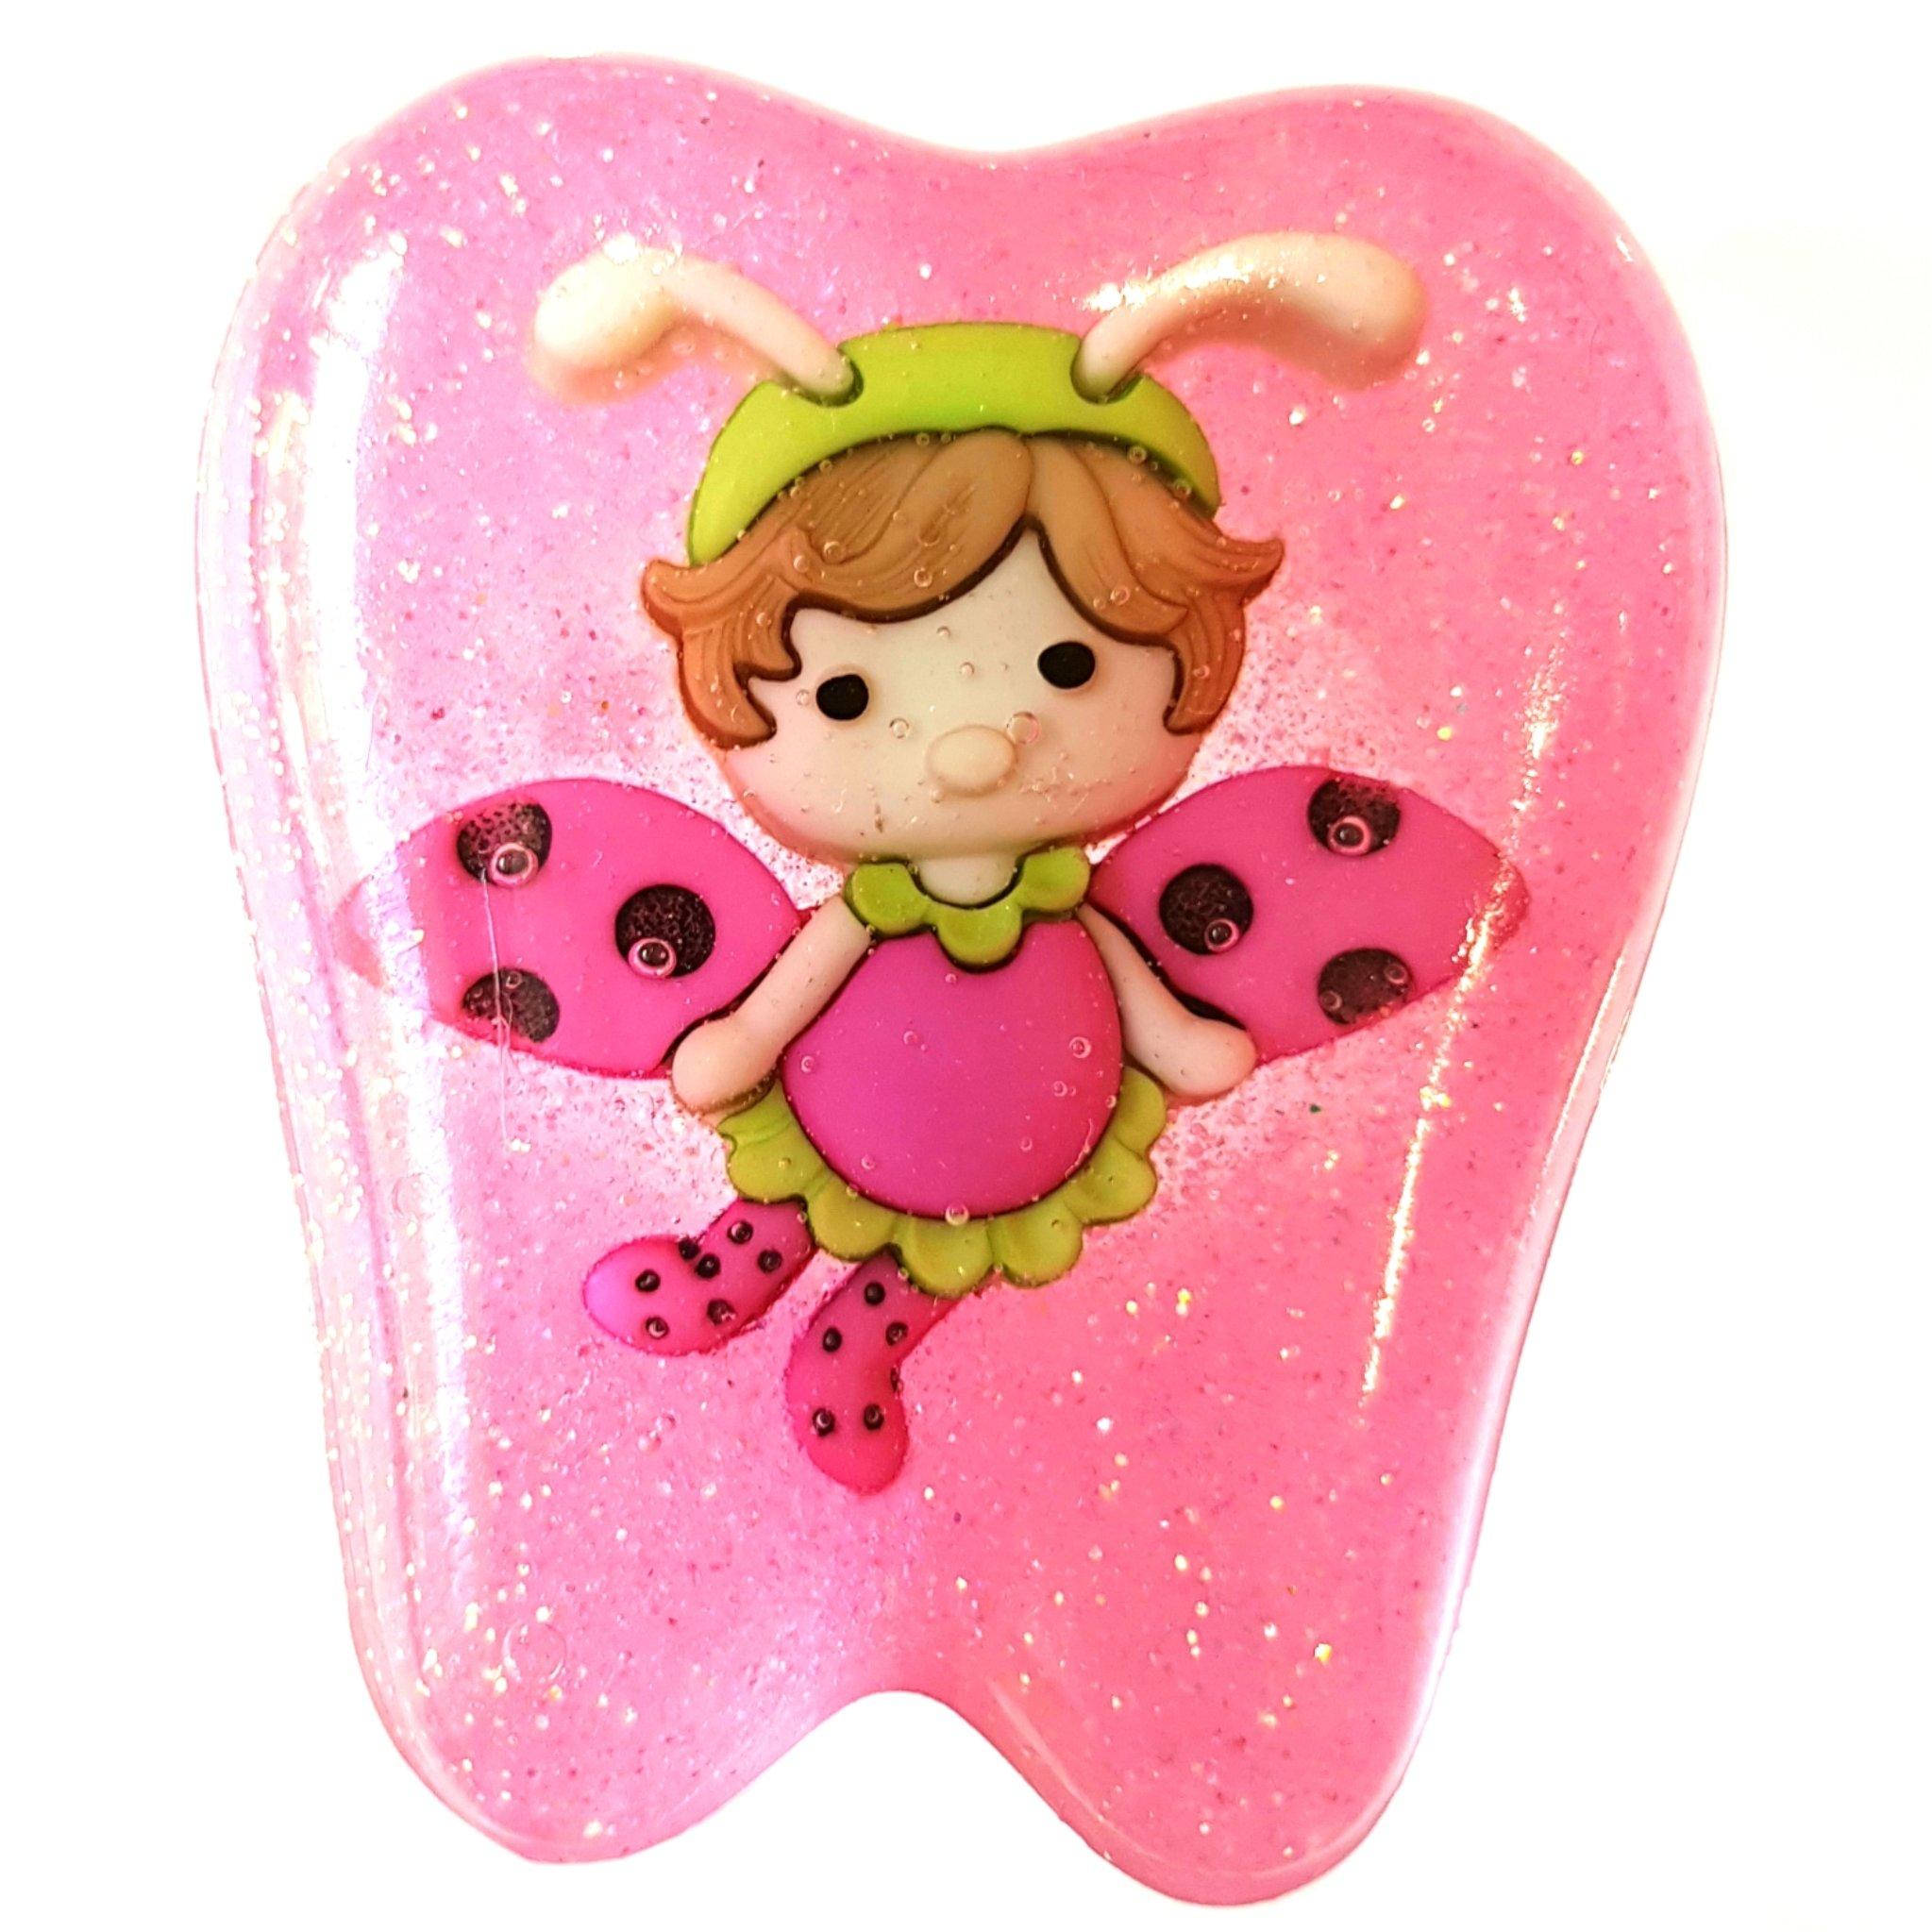 Handmade Resin Tooth Fairy Box by Flying Fairy Creations